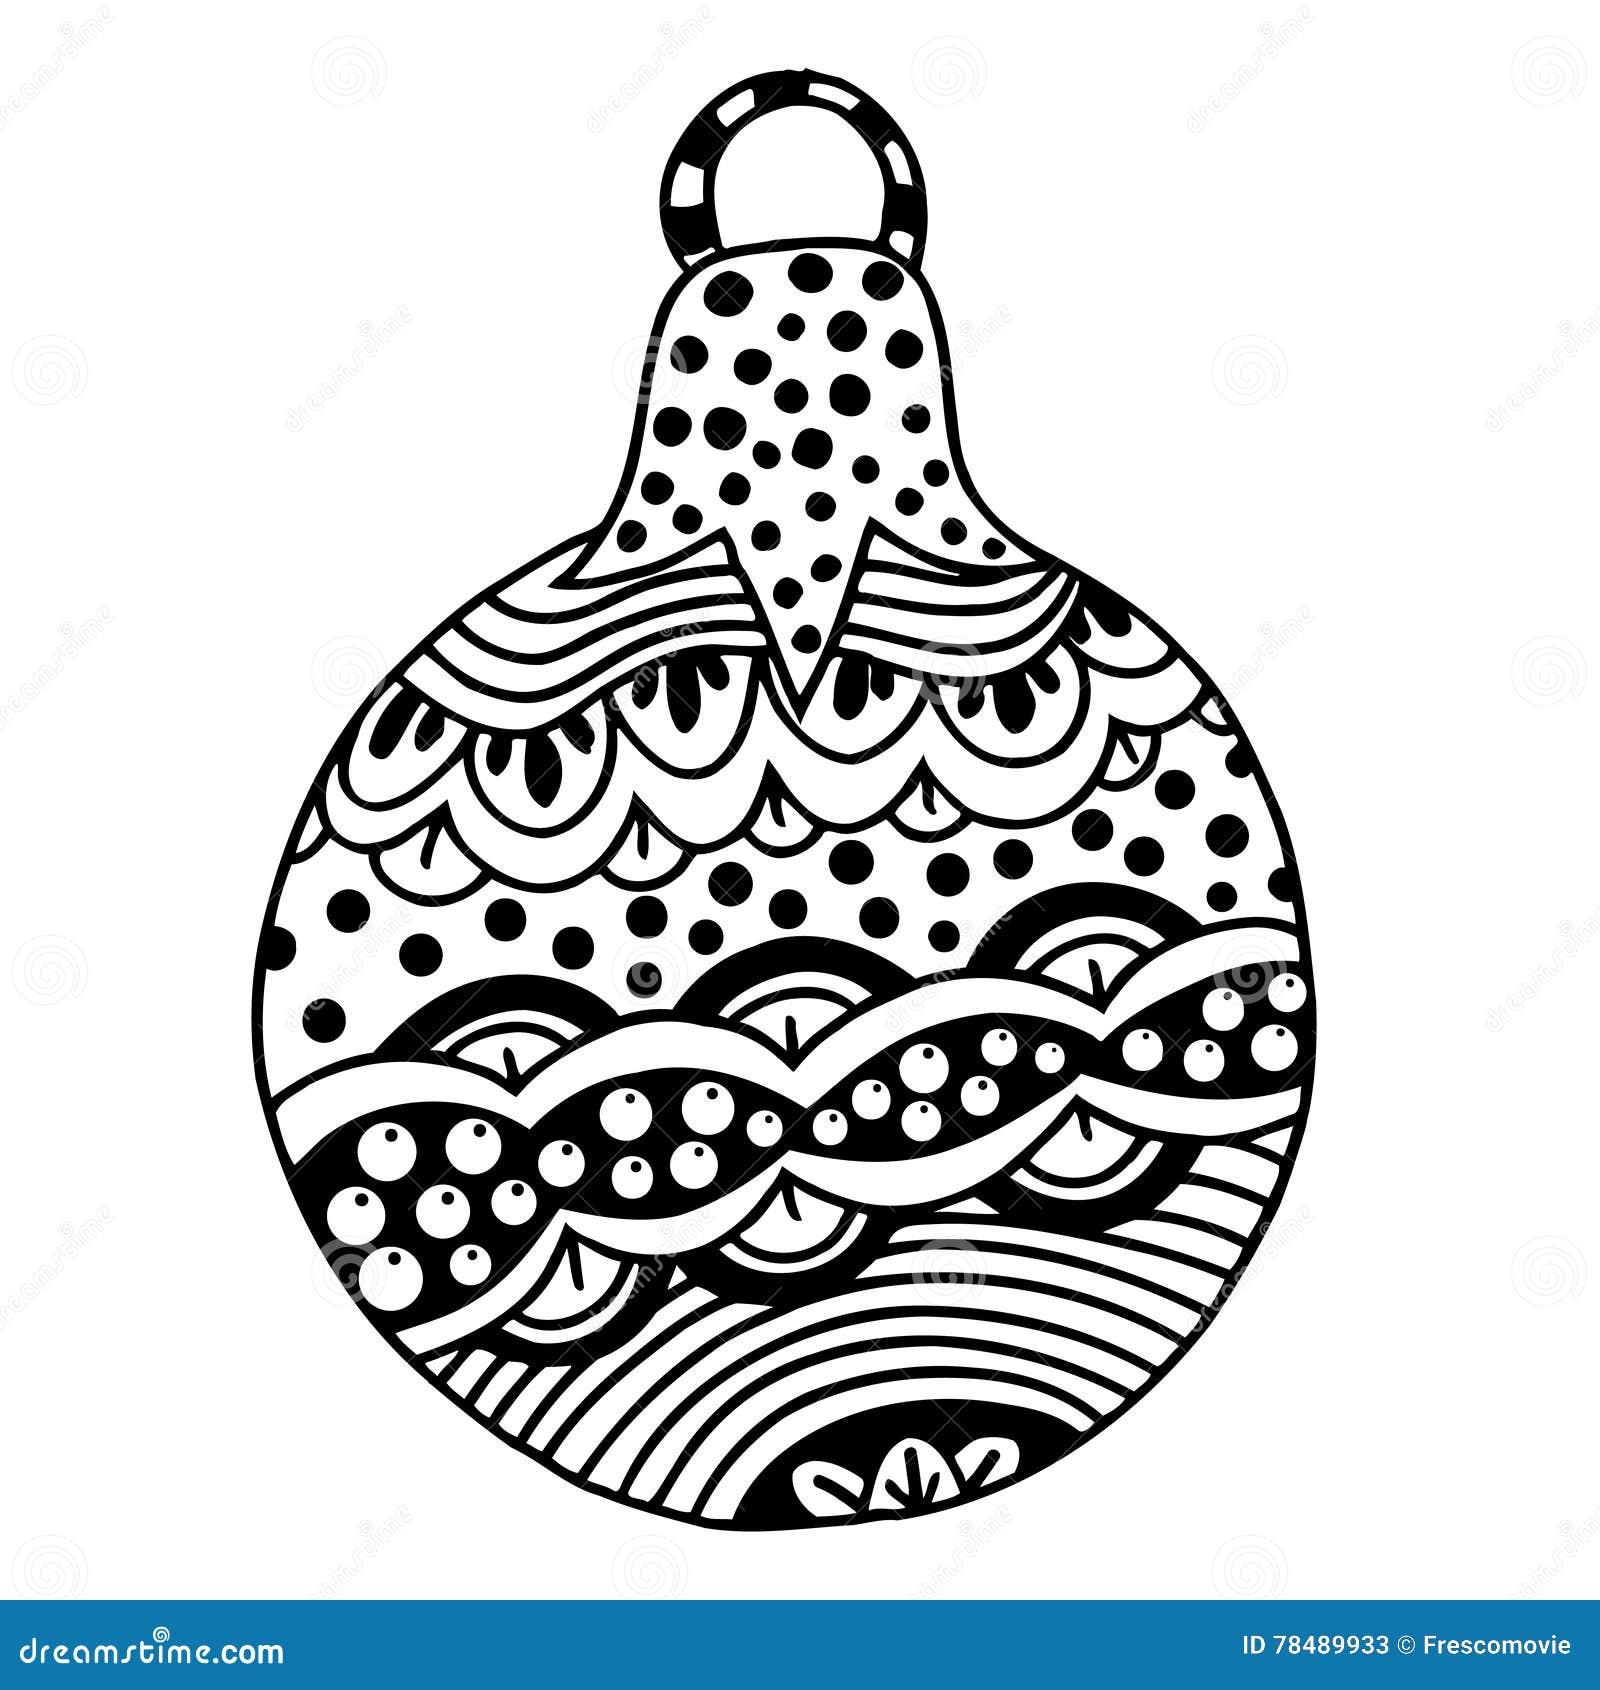 Black And White Christmas Ball Stock Vector - Illustration of ...